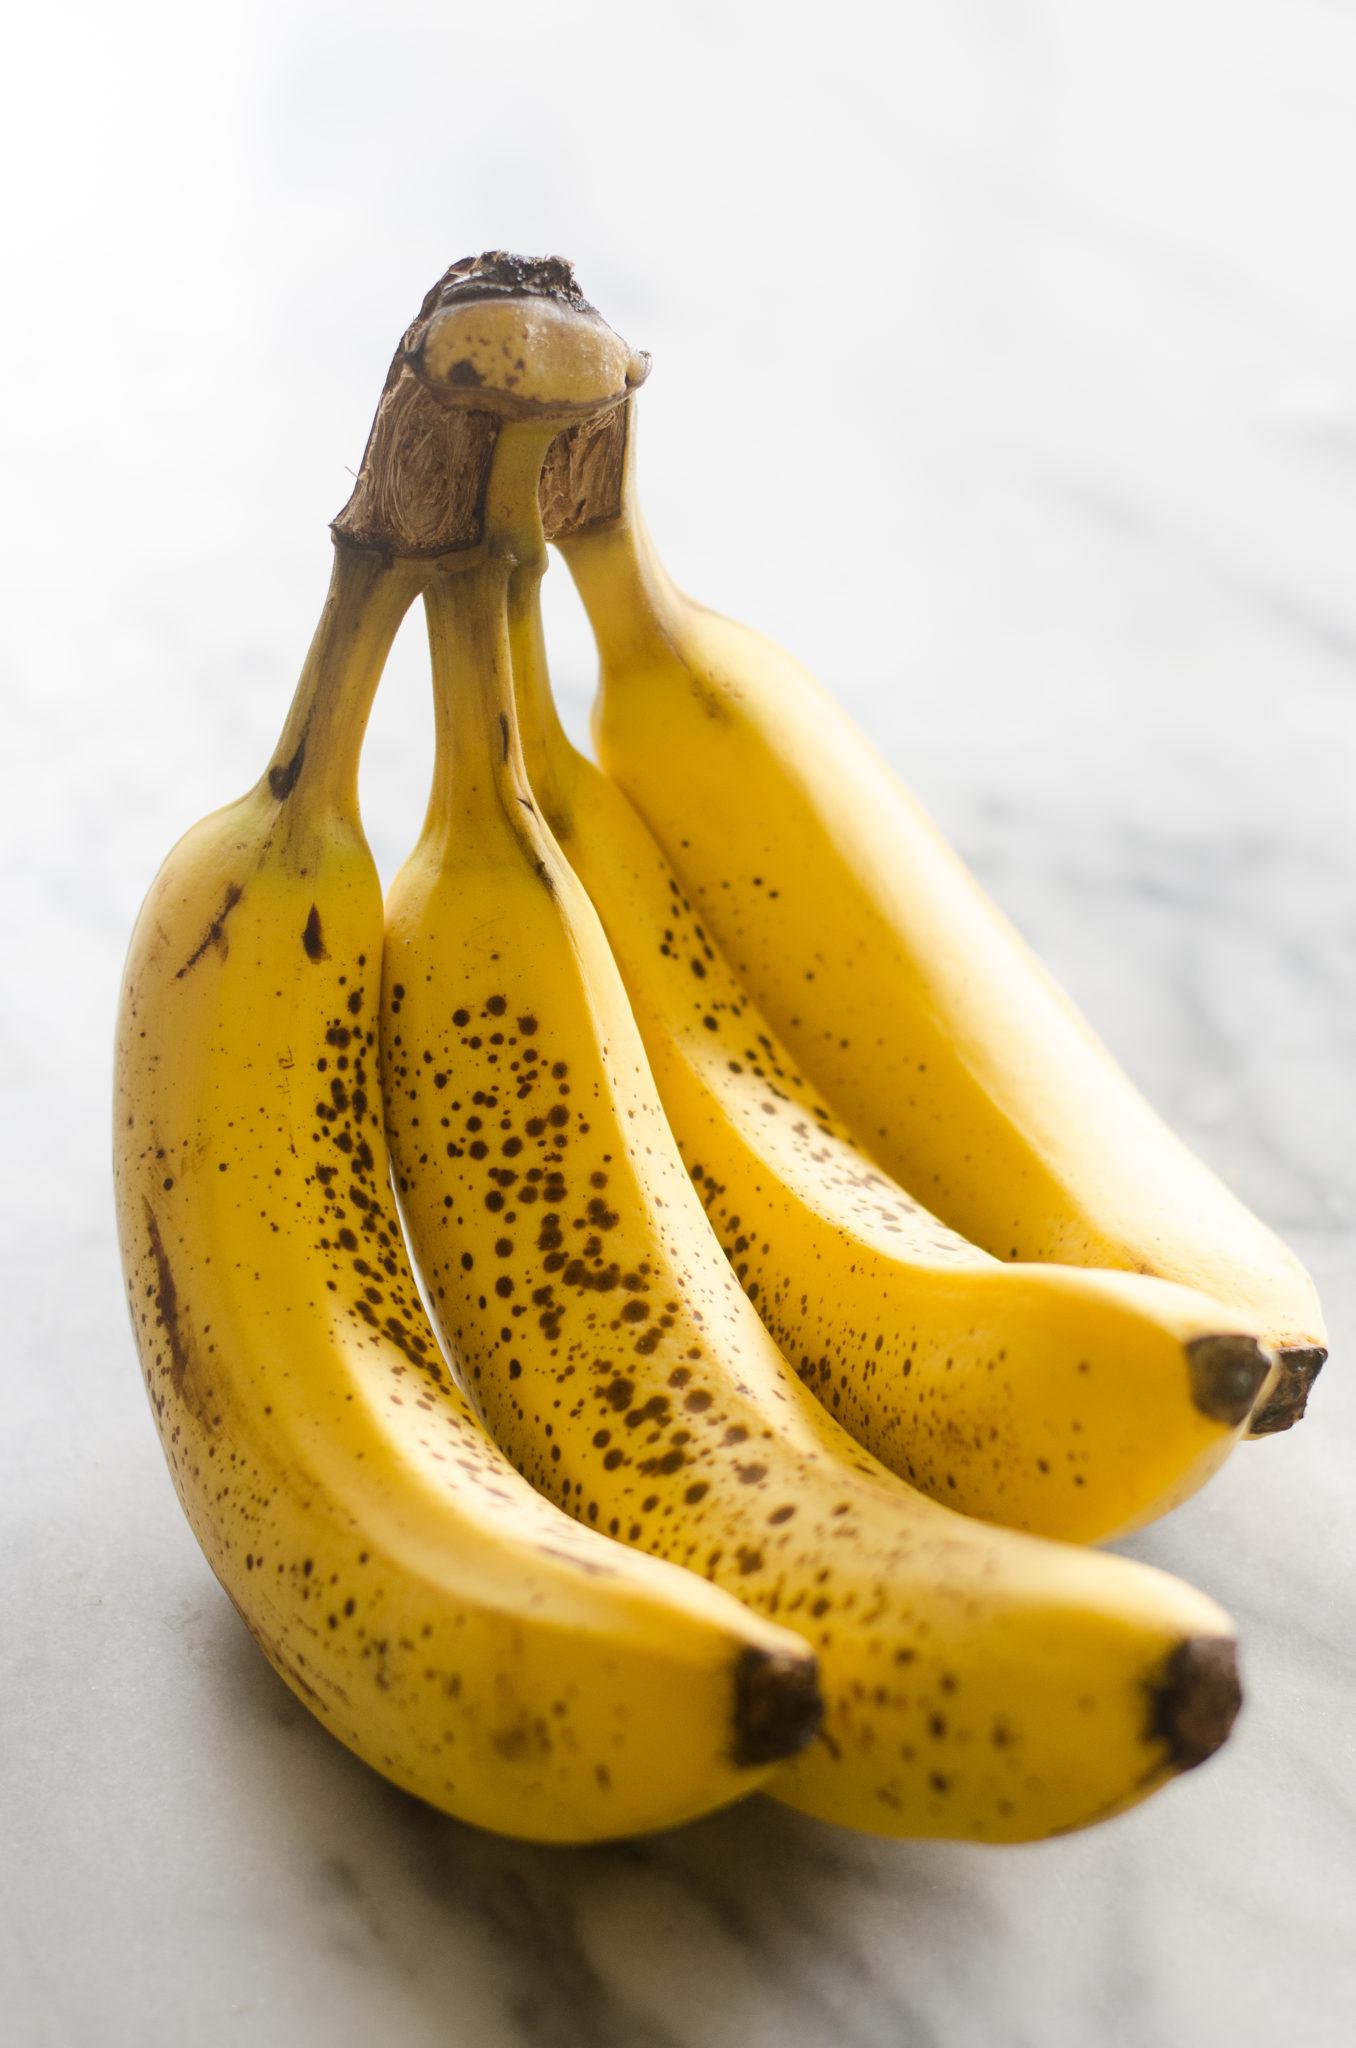 Coconut Flour Banana Bread (Gluten Free, Grain Free, Nut Free, Paleo Friendly, Sugar Free)